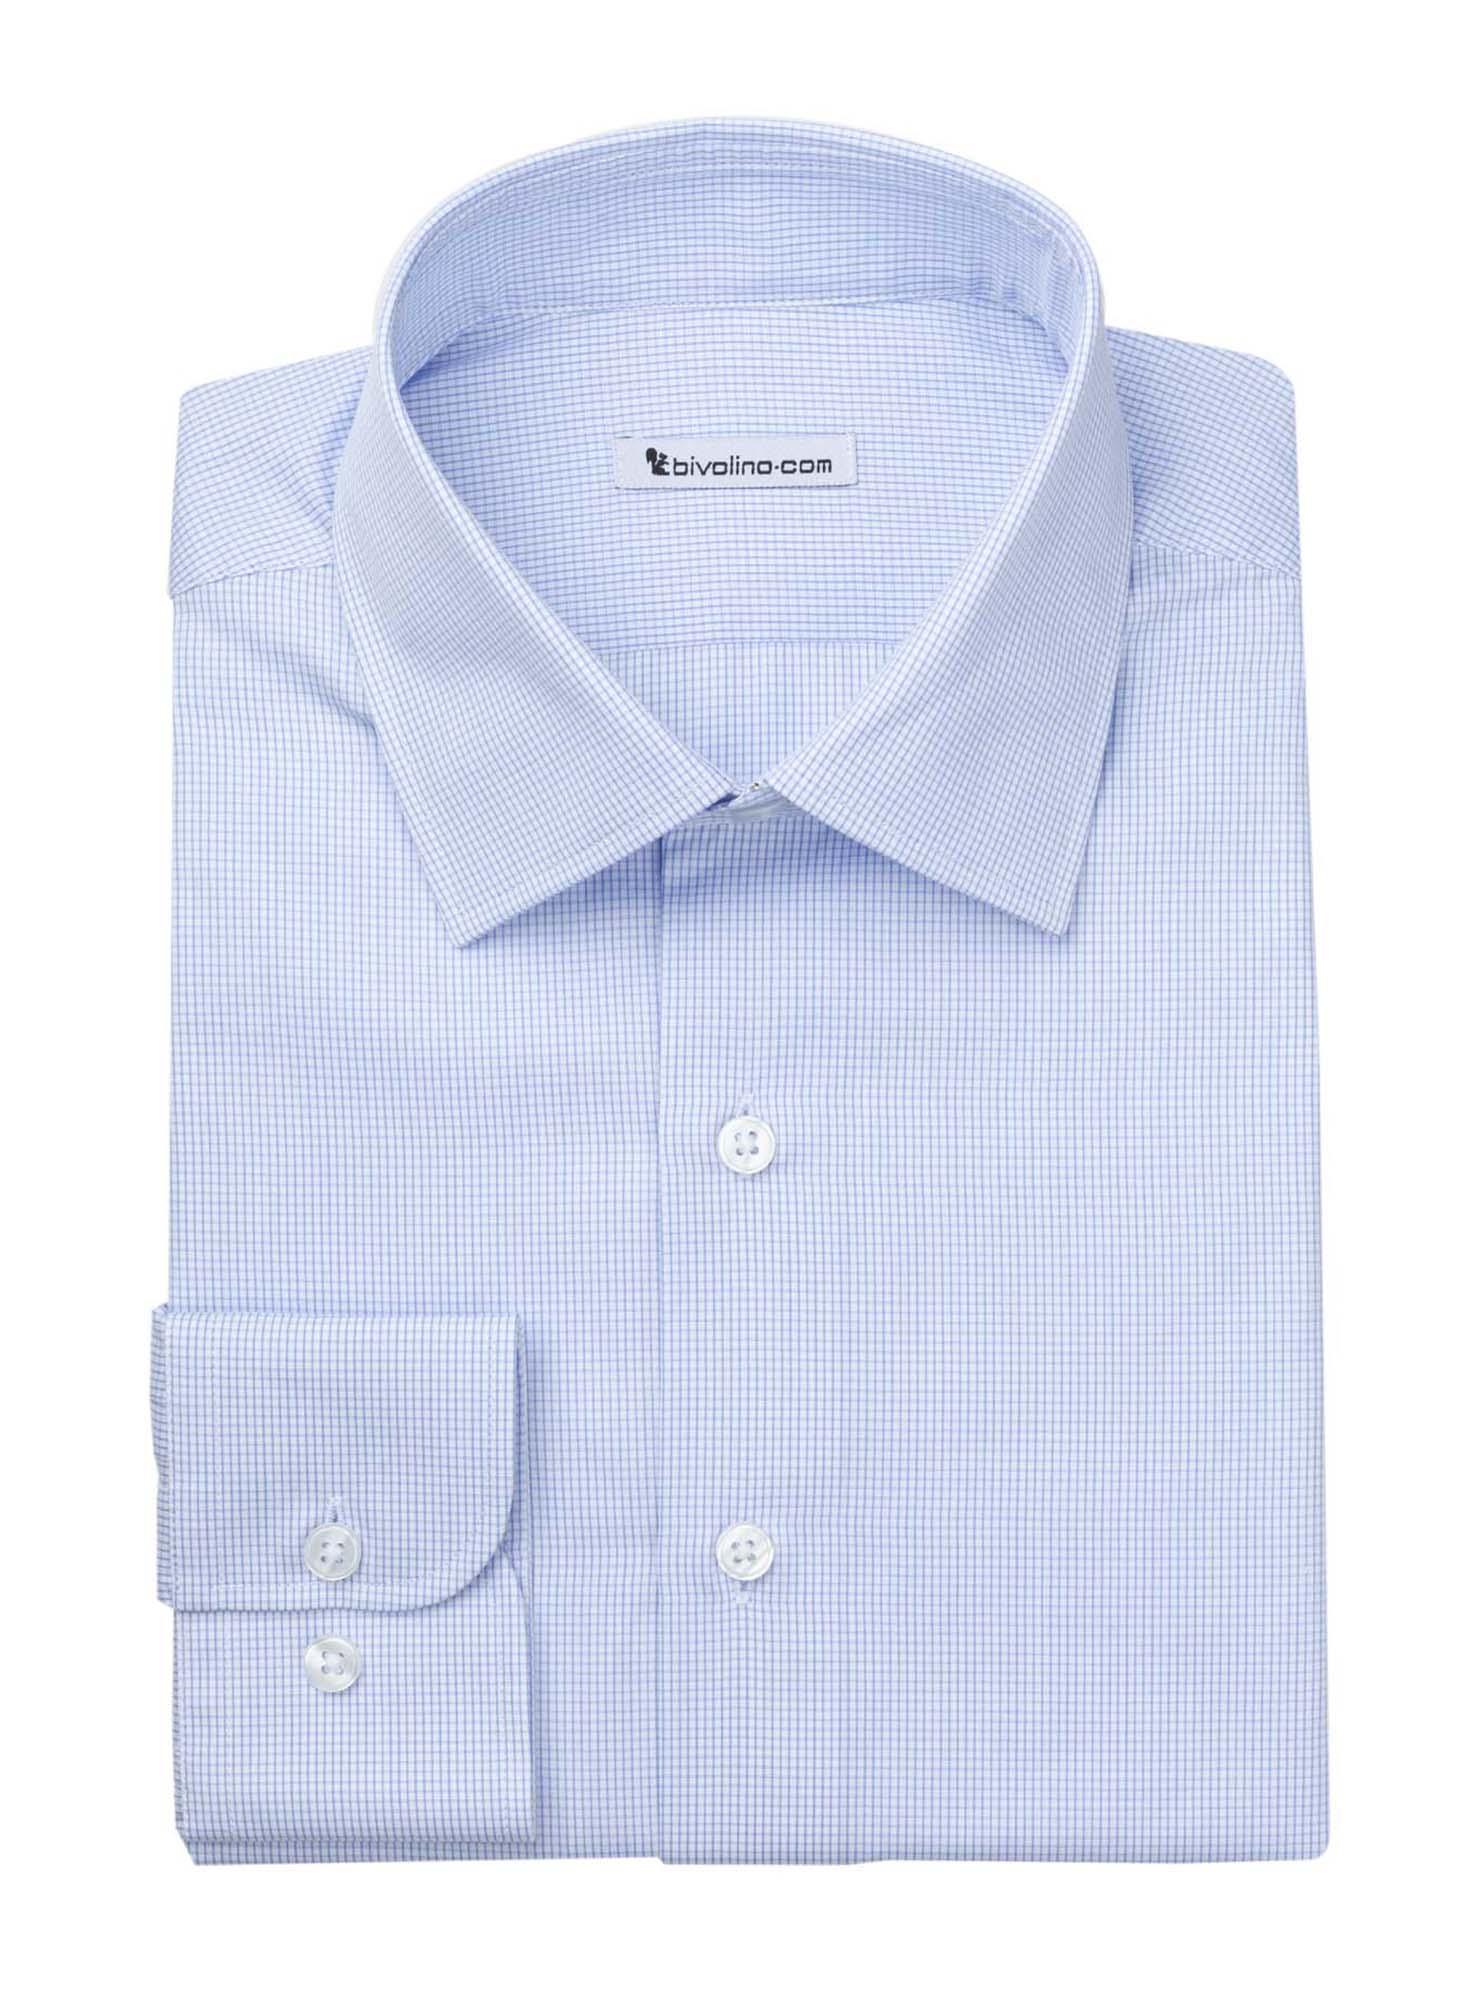 MARANO - Männerhemd Supima Baumwolle  - DOCRA 7